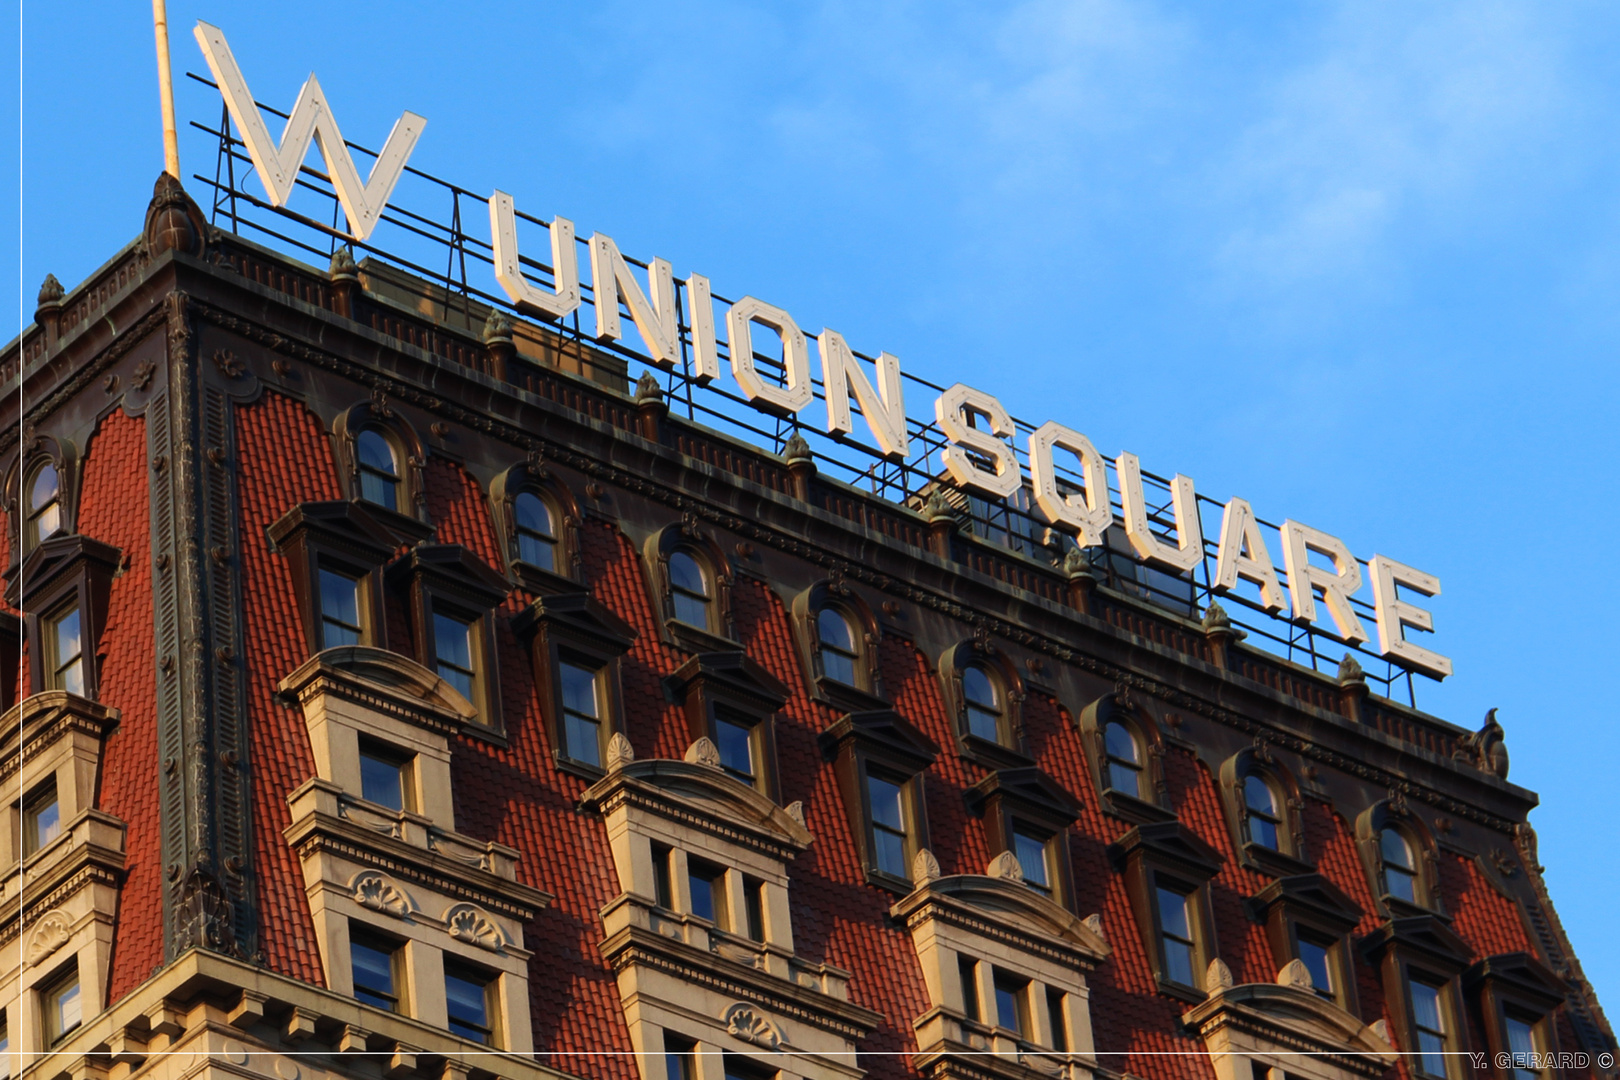 Union Square - Roof